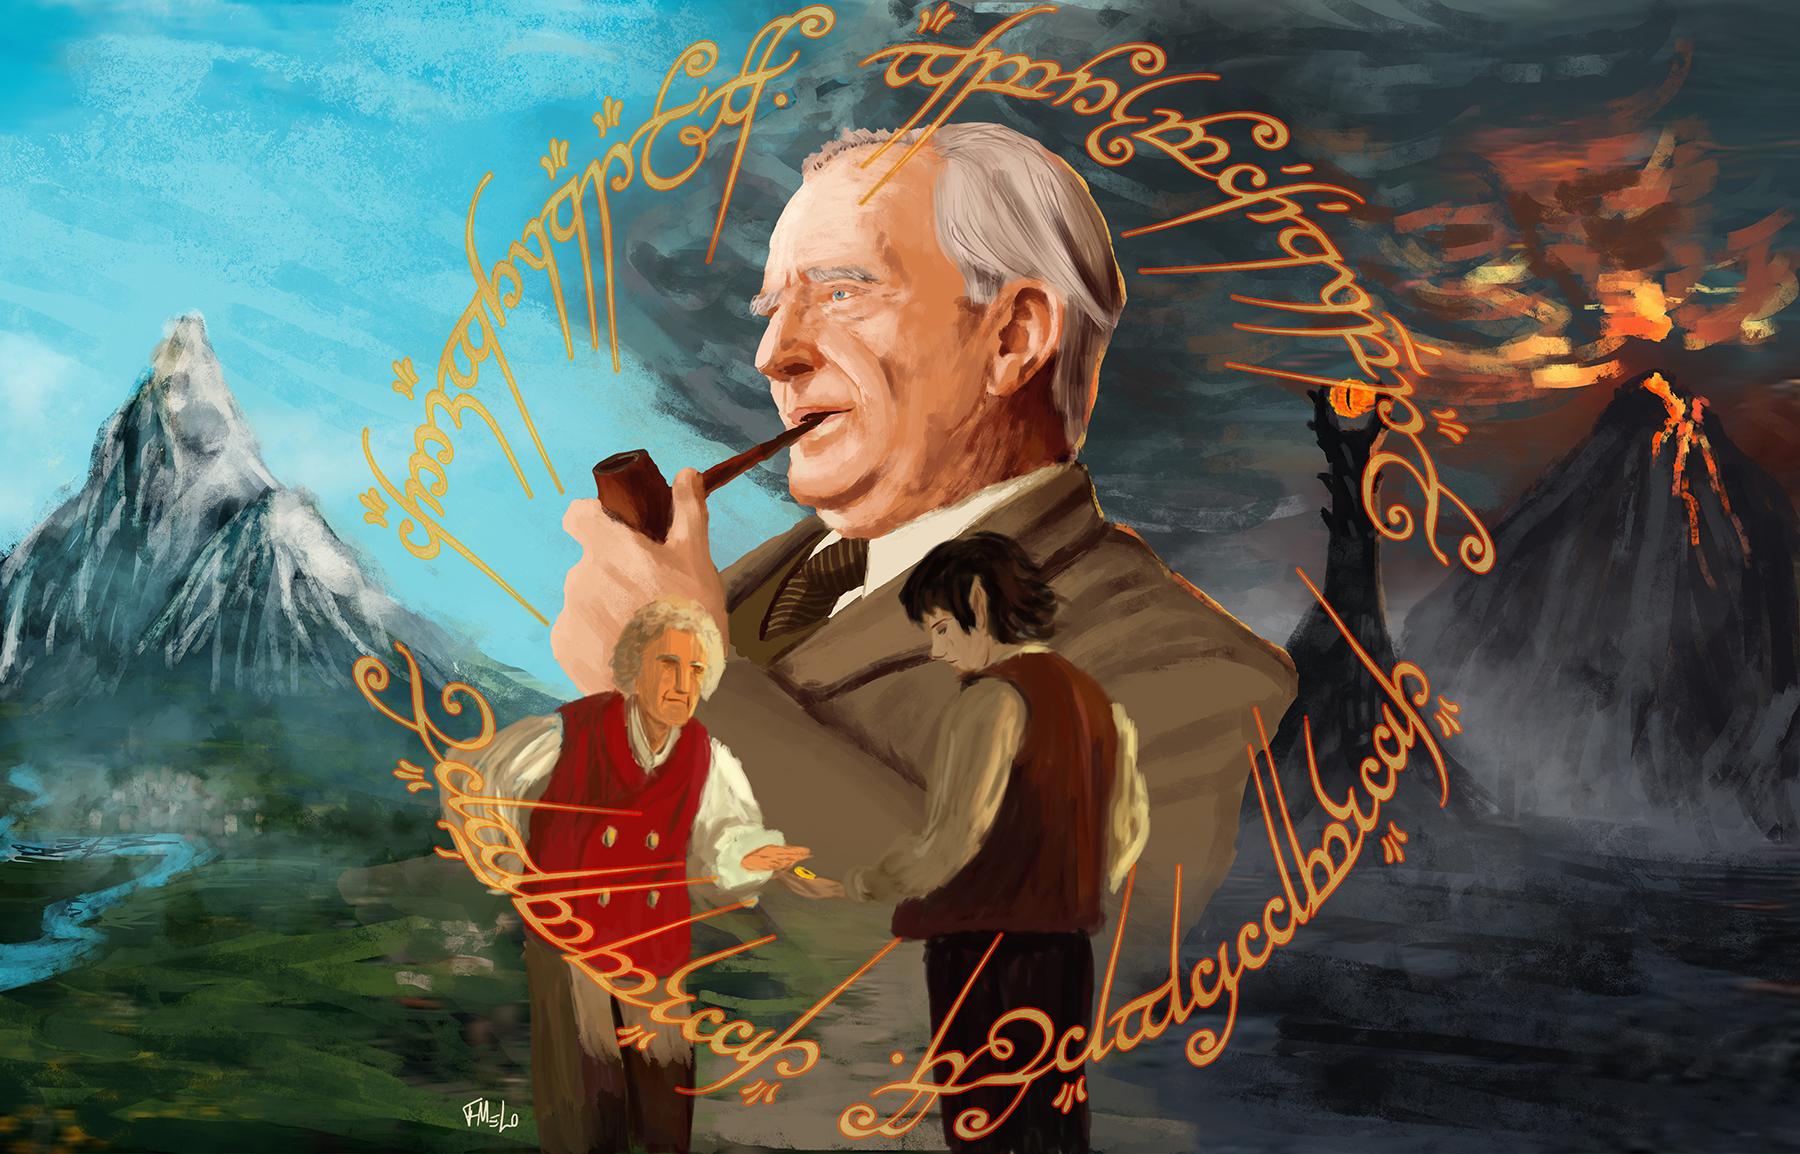 Tolkien's Masterpieces